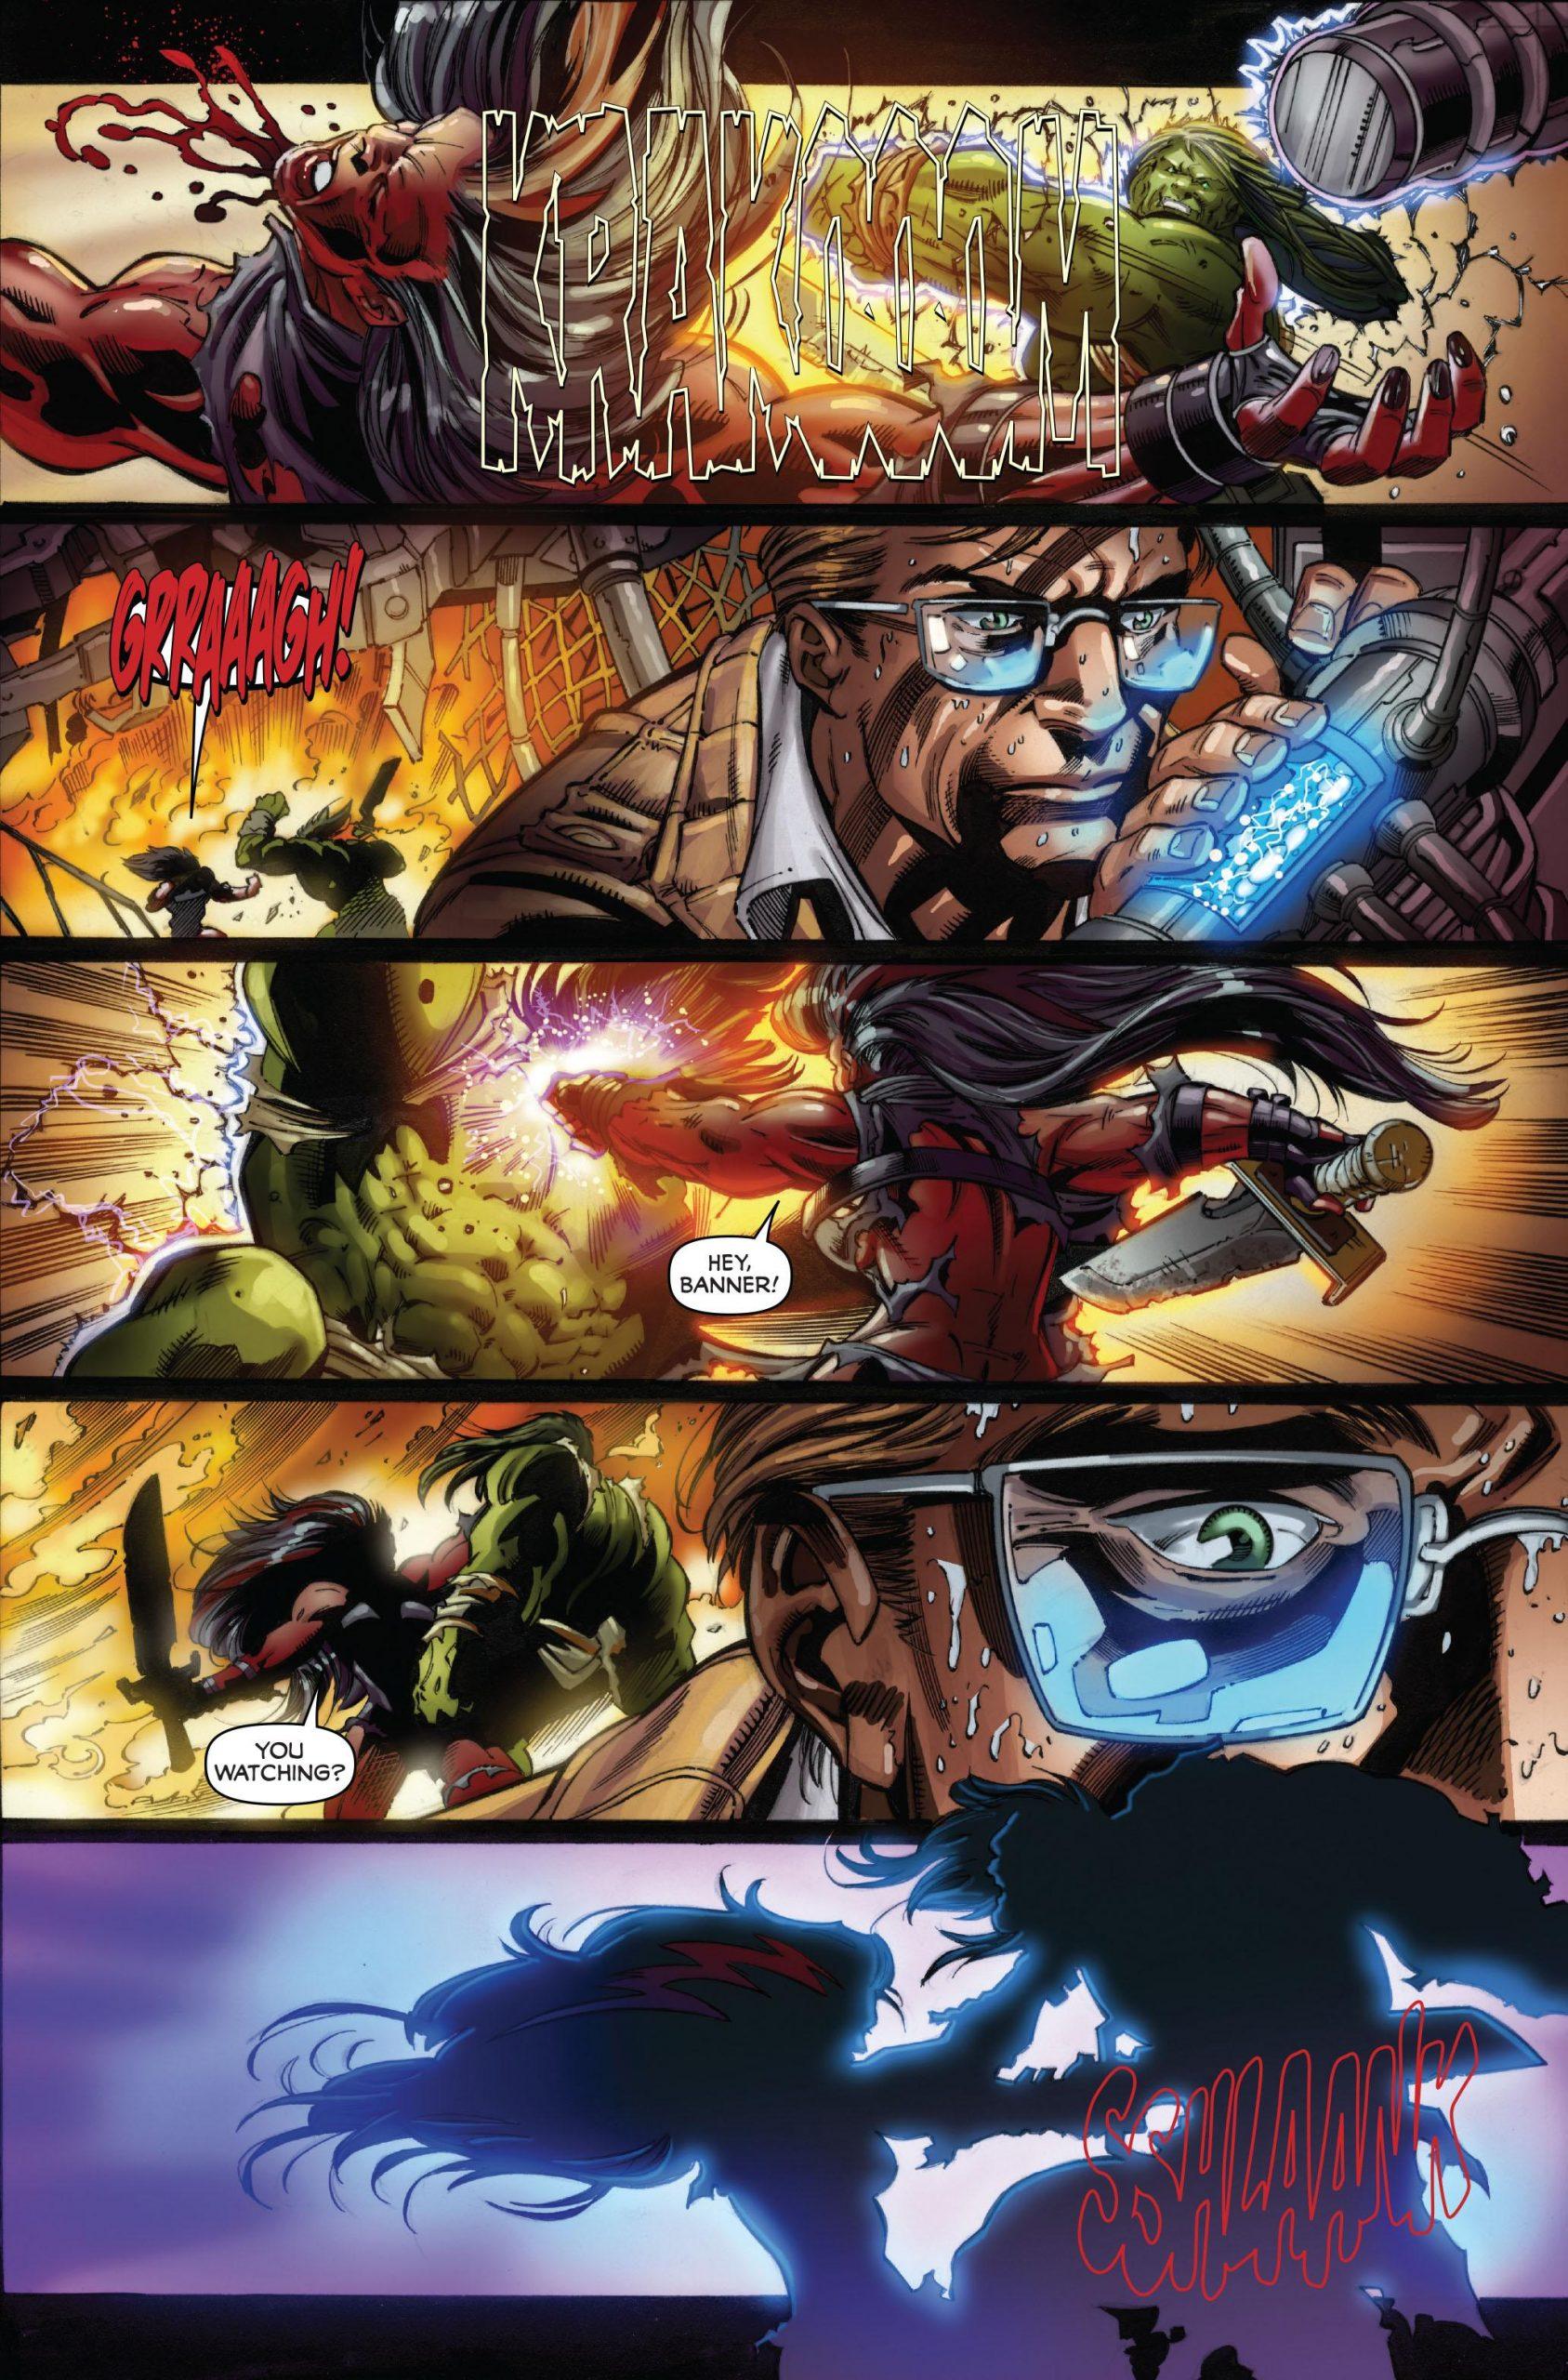 Incredible Hulk - Fall of the Hulks review